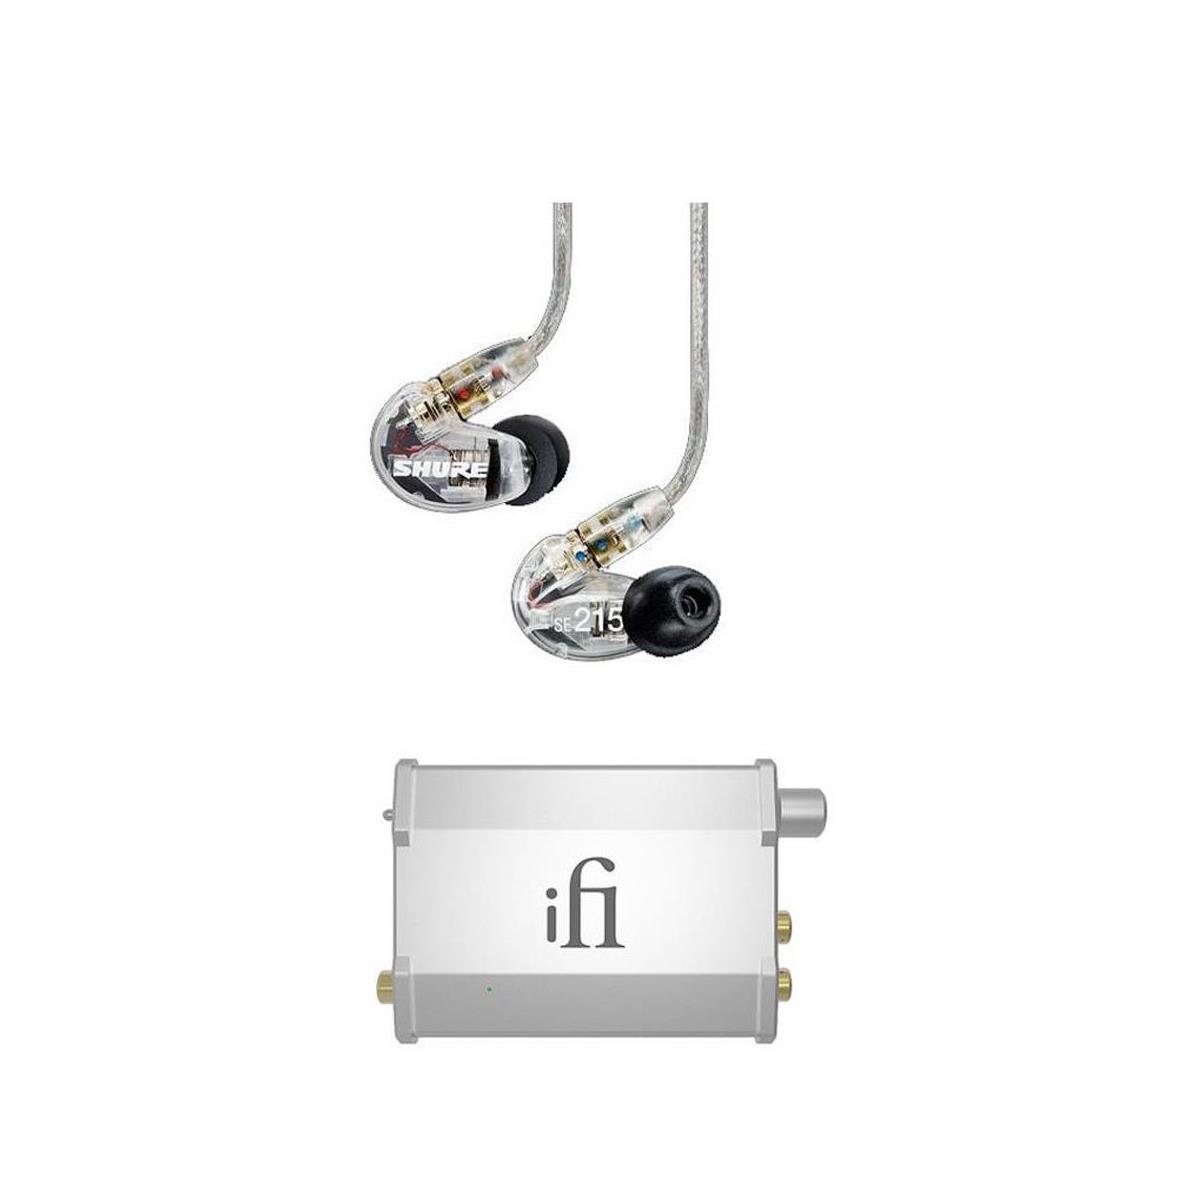 Shure SE215 In-Ear Headophones + iFi Nano iDSD Portable Amp / Dac $200 + free shipping